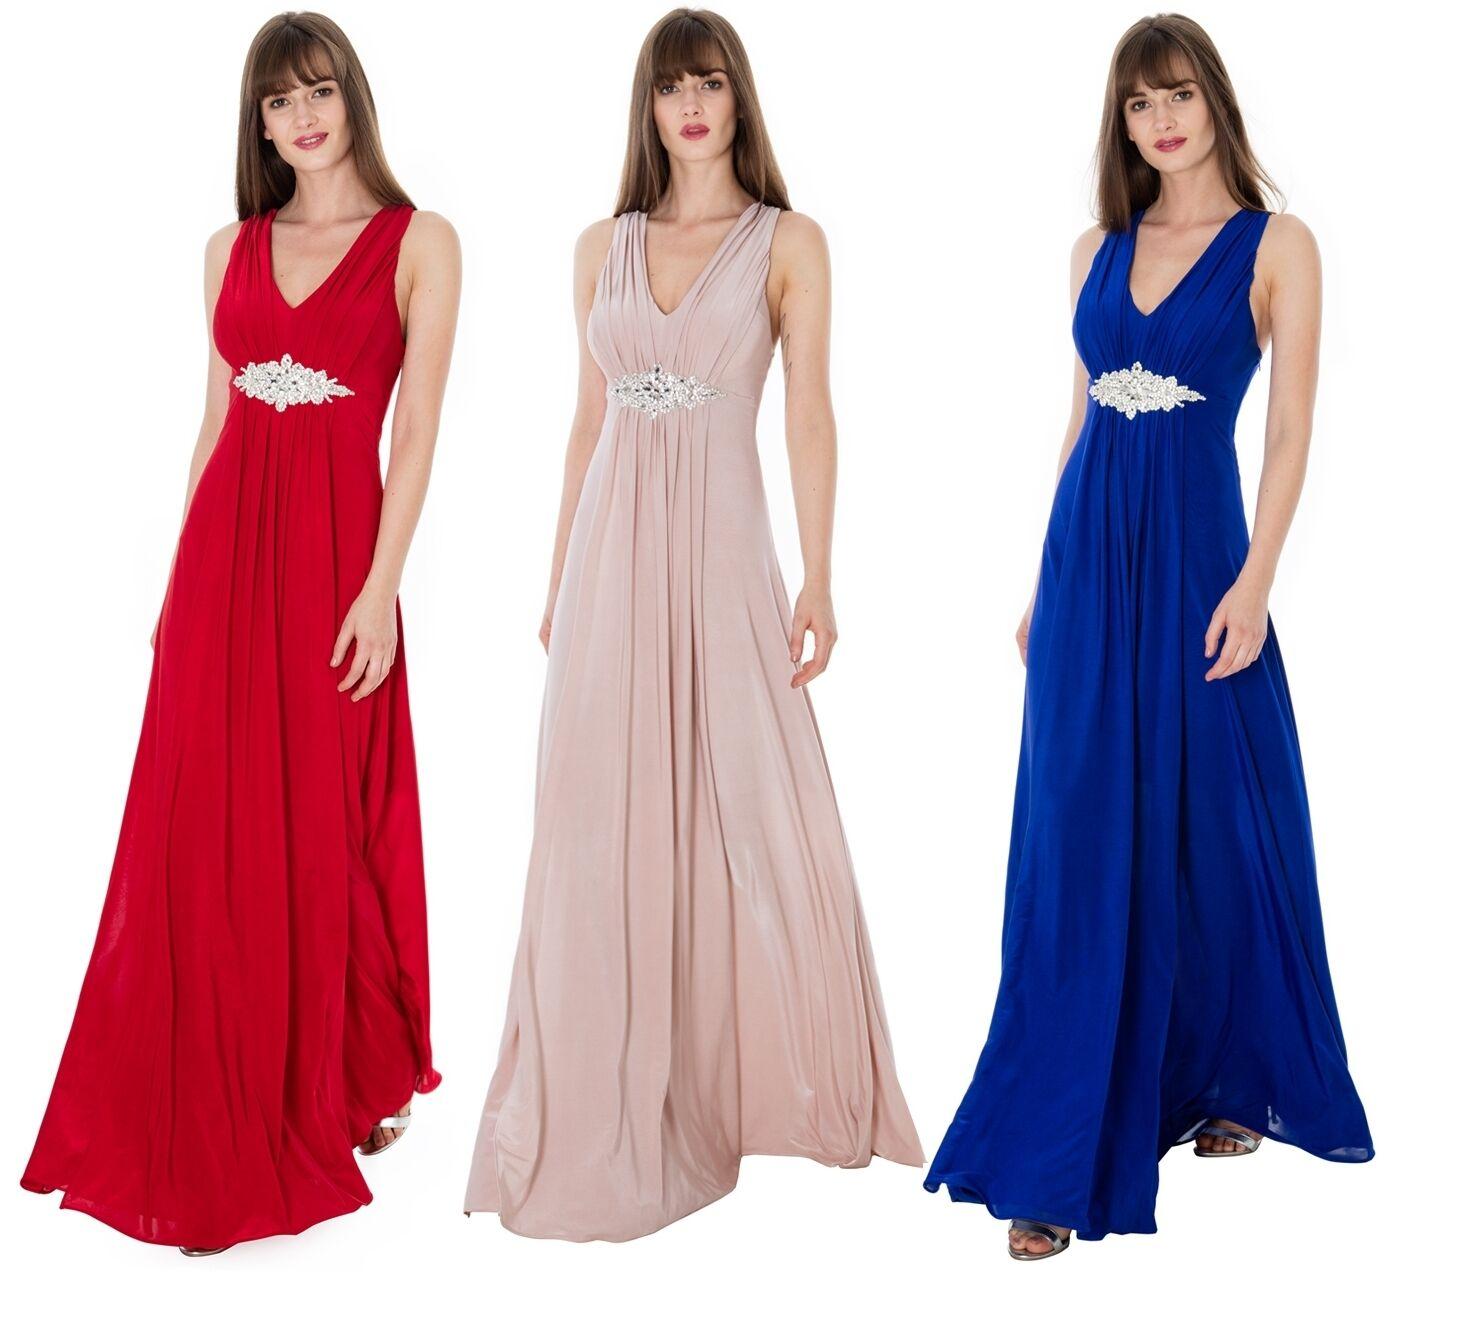 2f290baa3b8 Jewelled Waist Long Full Length Maxi Evening Party Gown RRP Dress Goddiva  nyqhqu4729-Bridesmaid Dresses